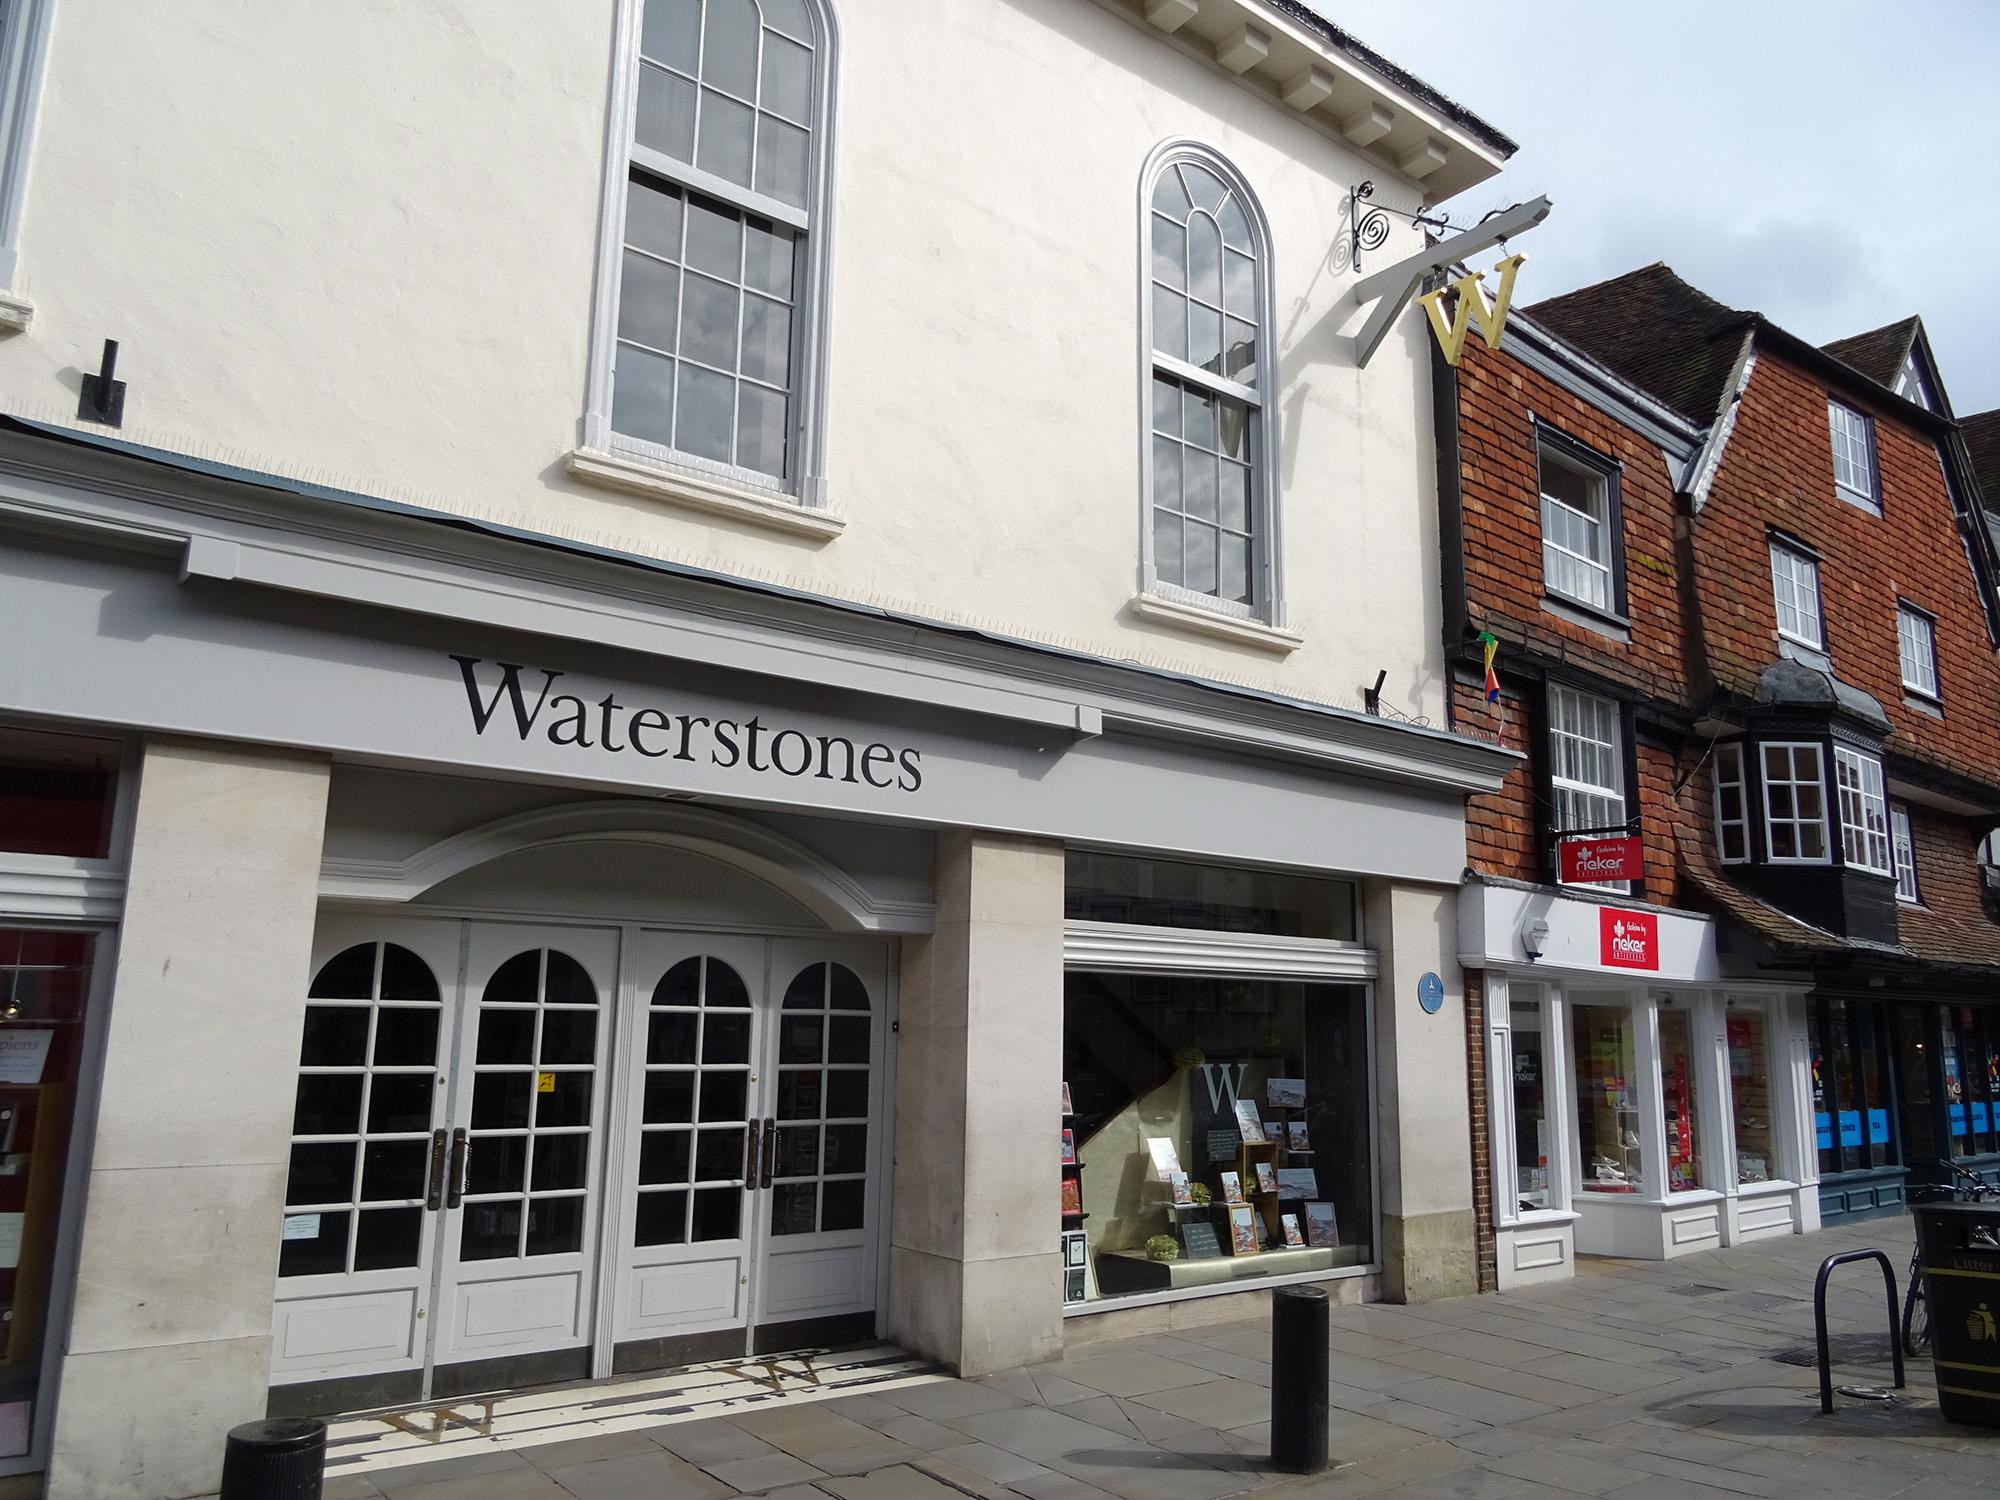 Salisbury dating site for single men and women in Dorset